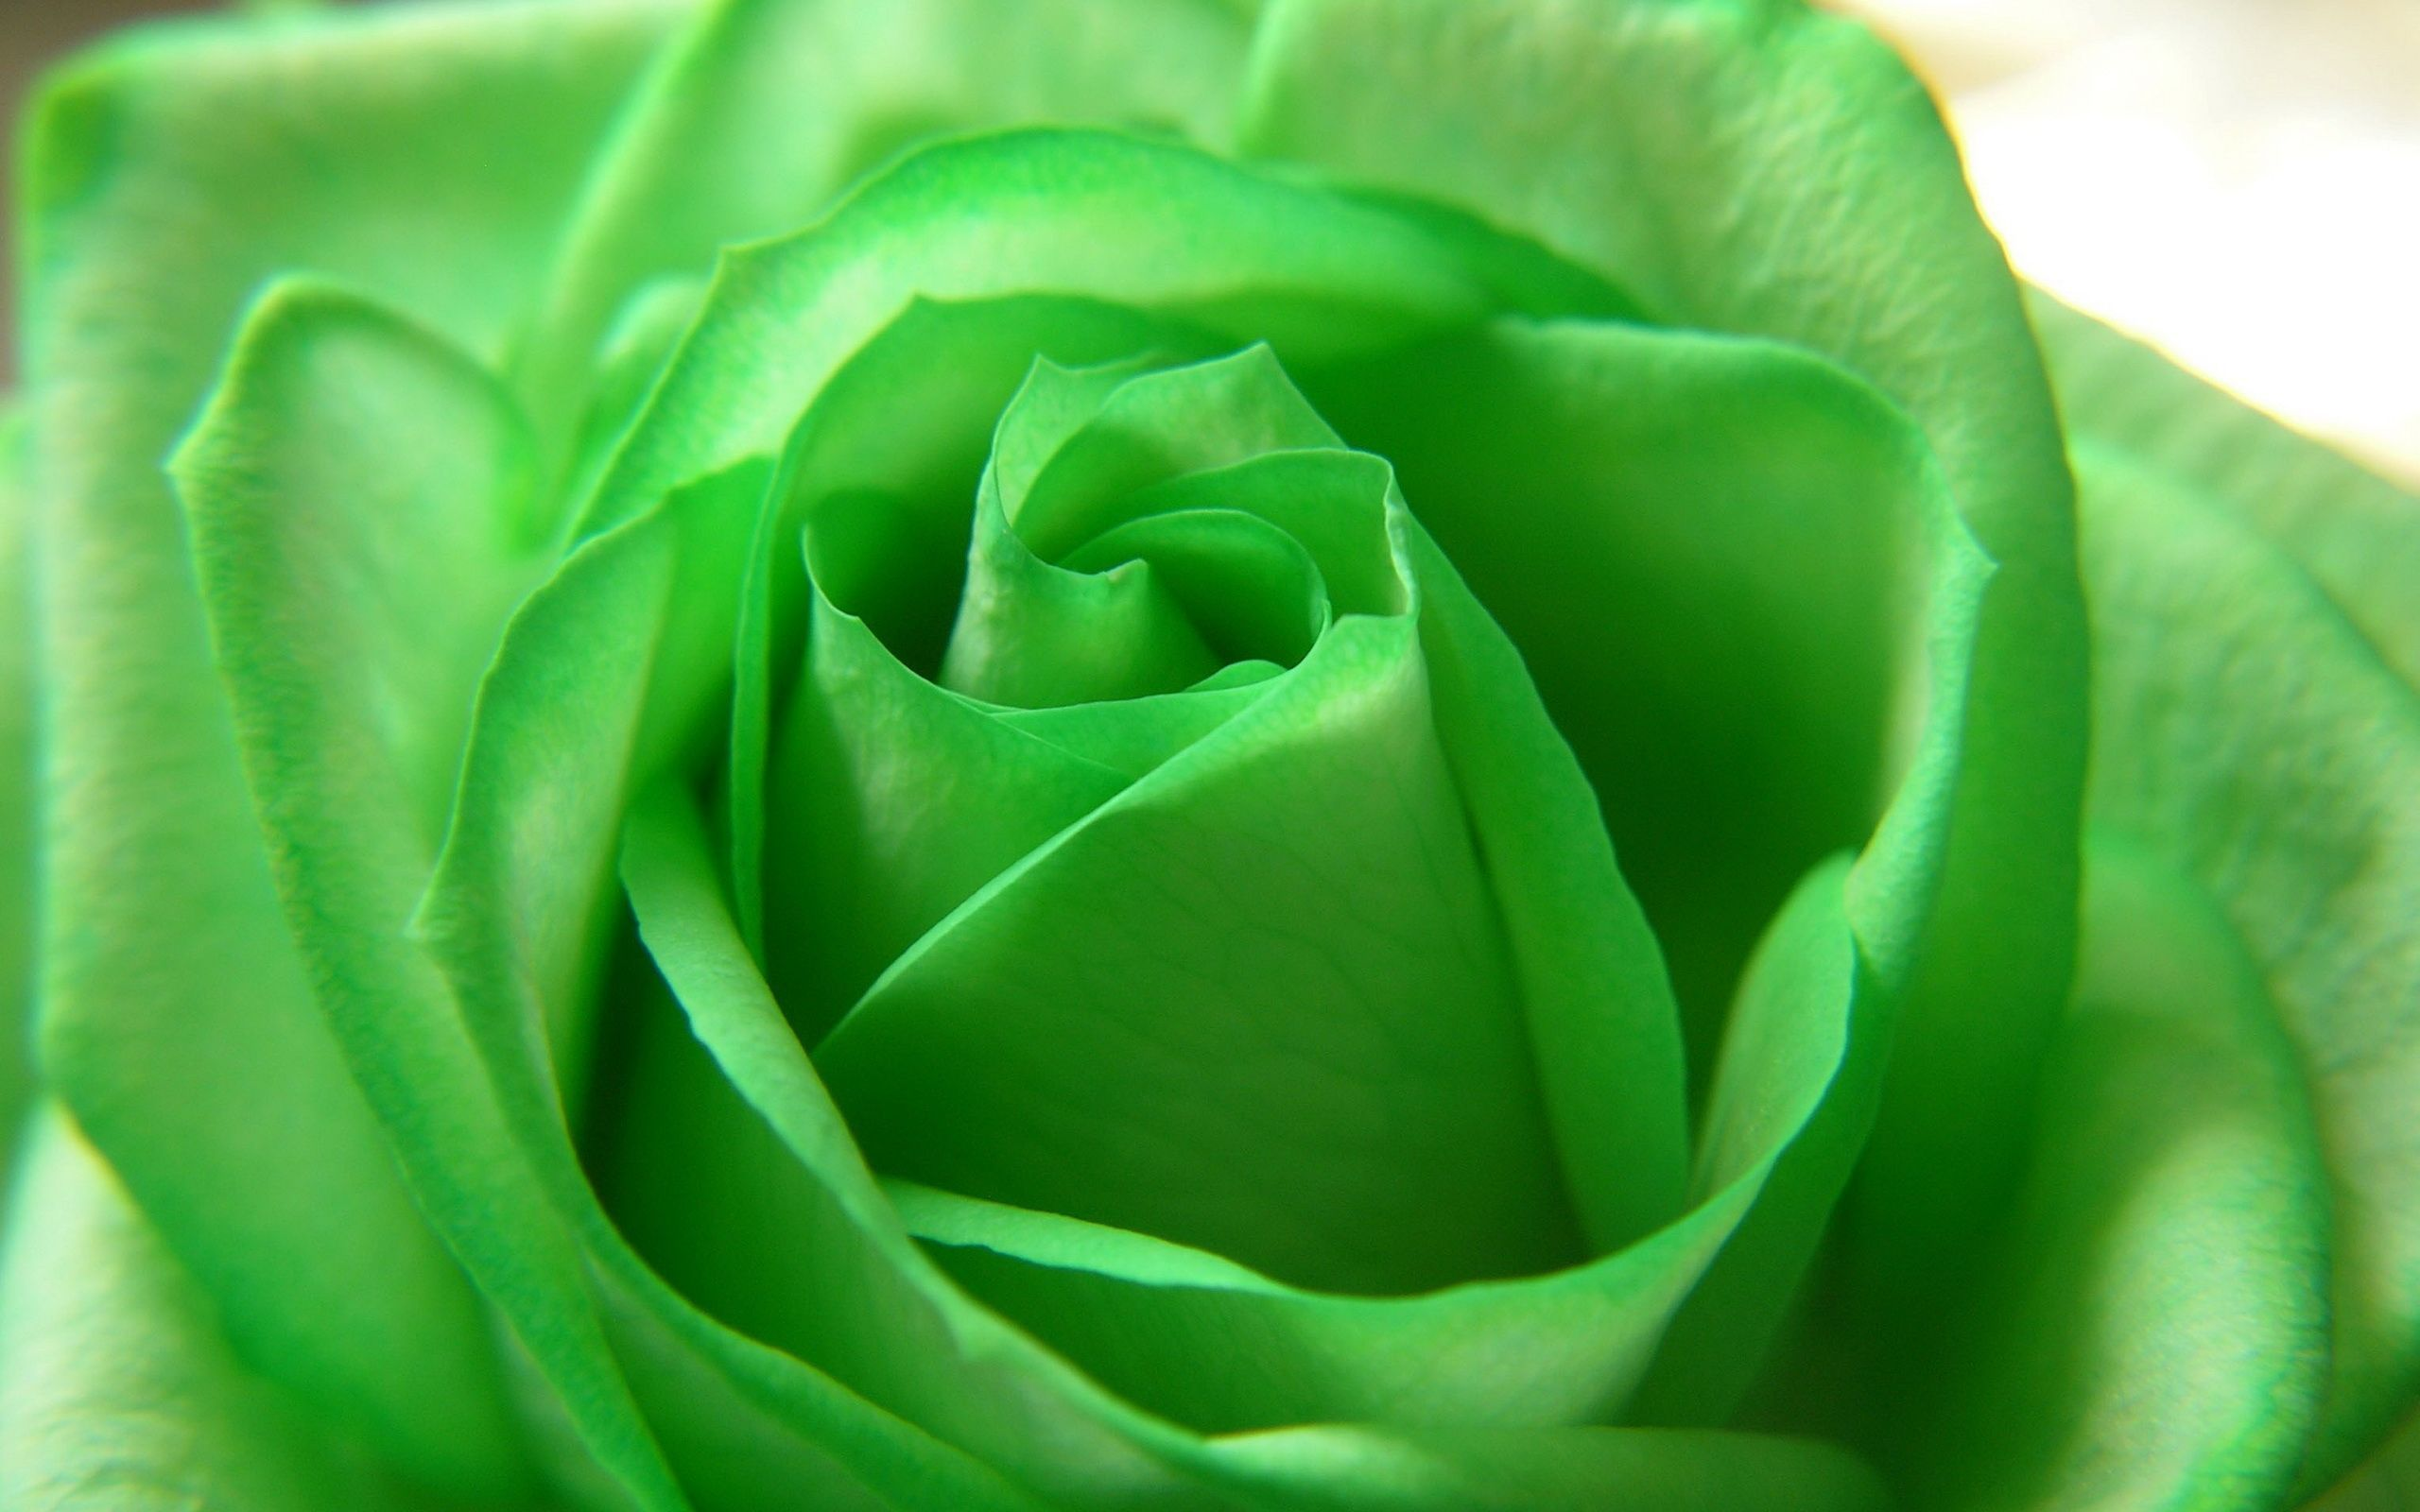 Green Flowers Desktop Wallpapers on WallpaperDog